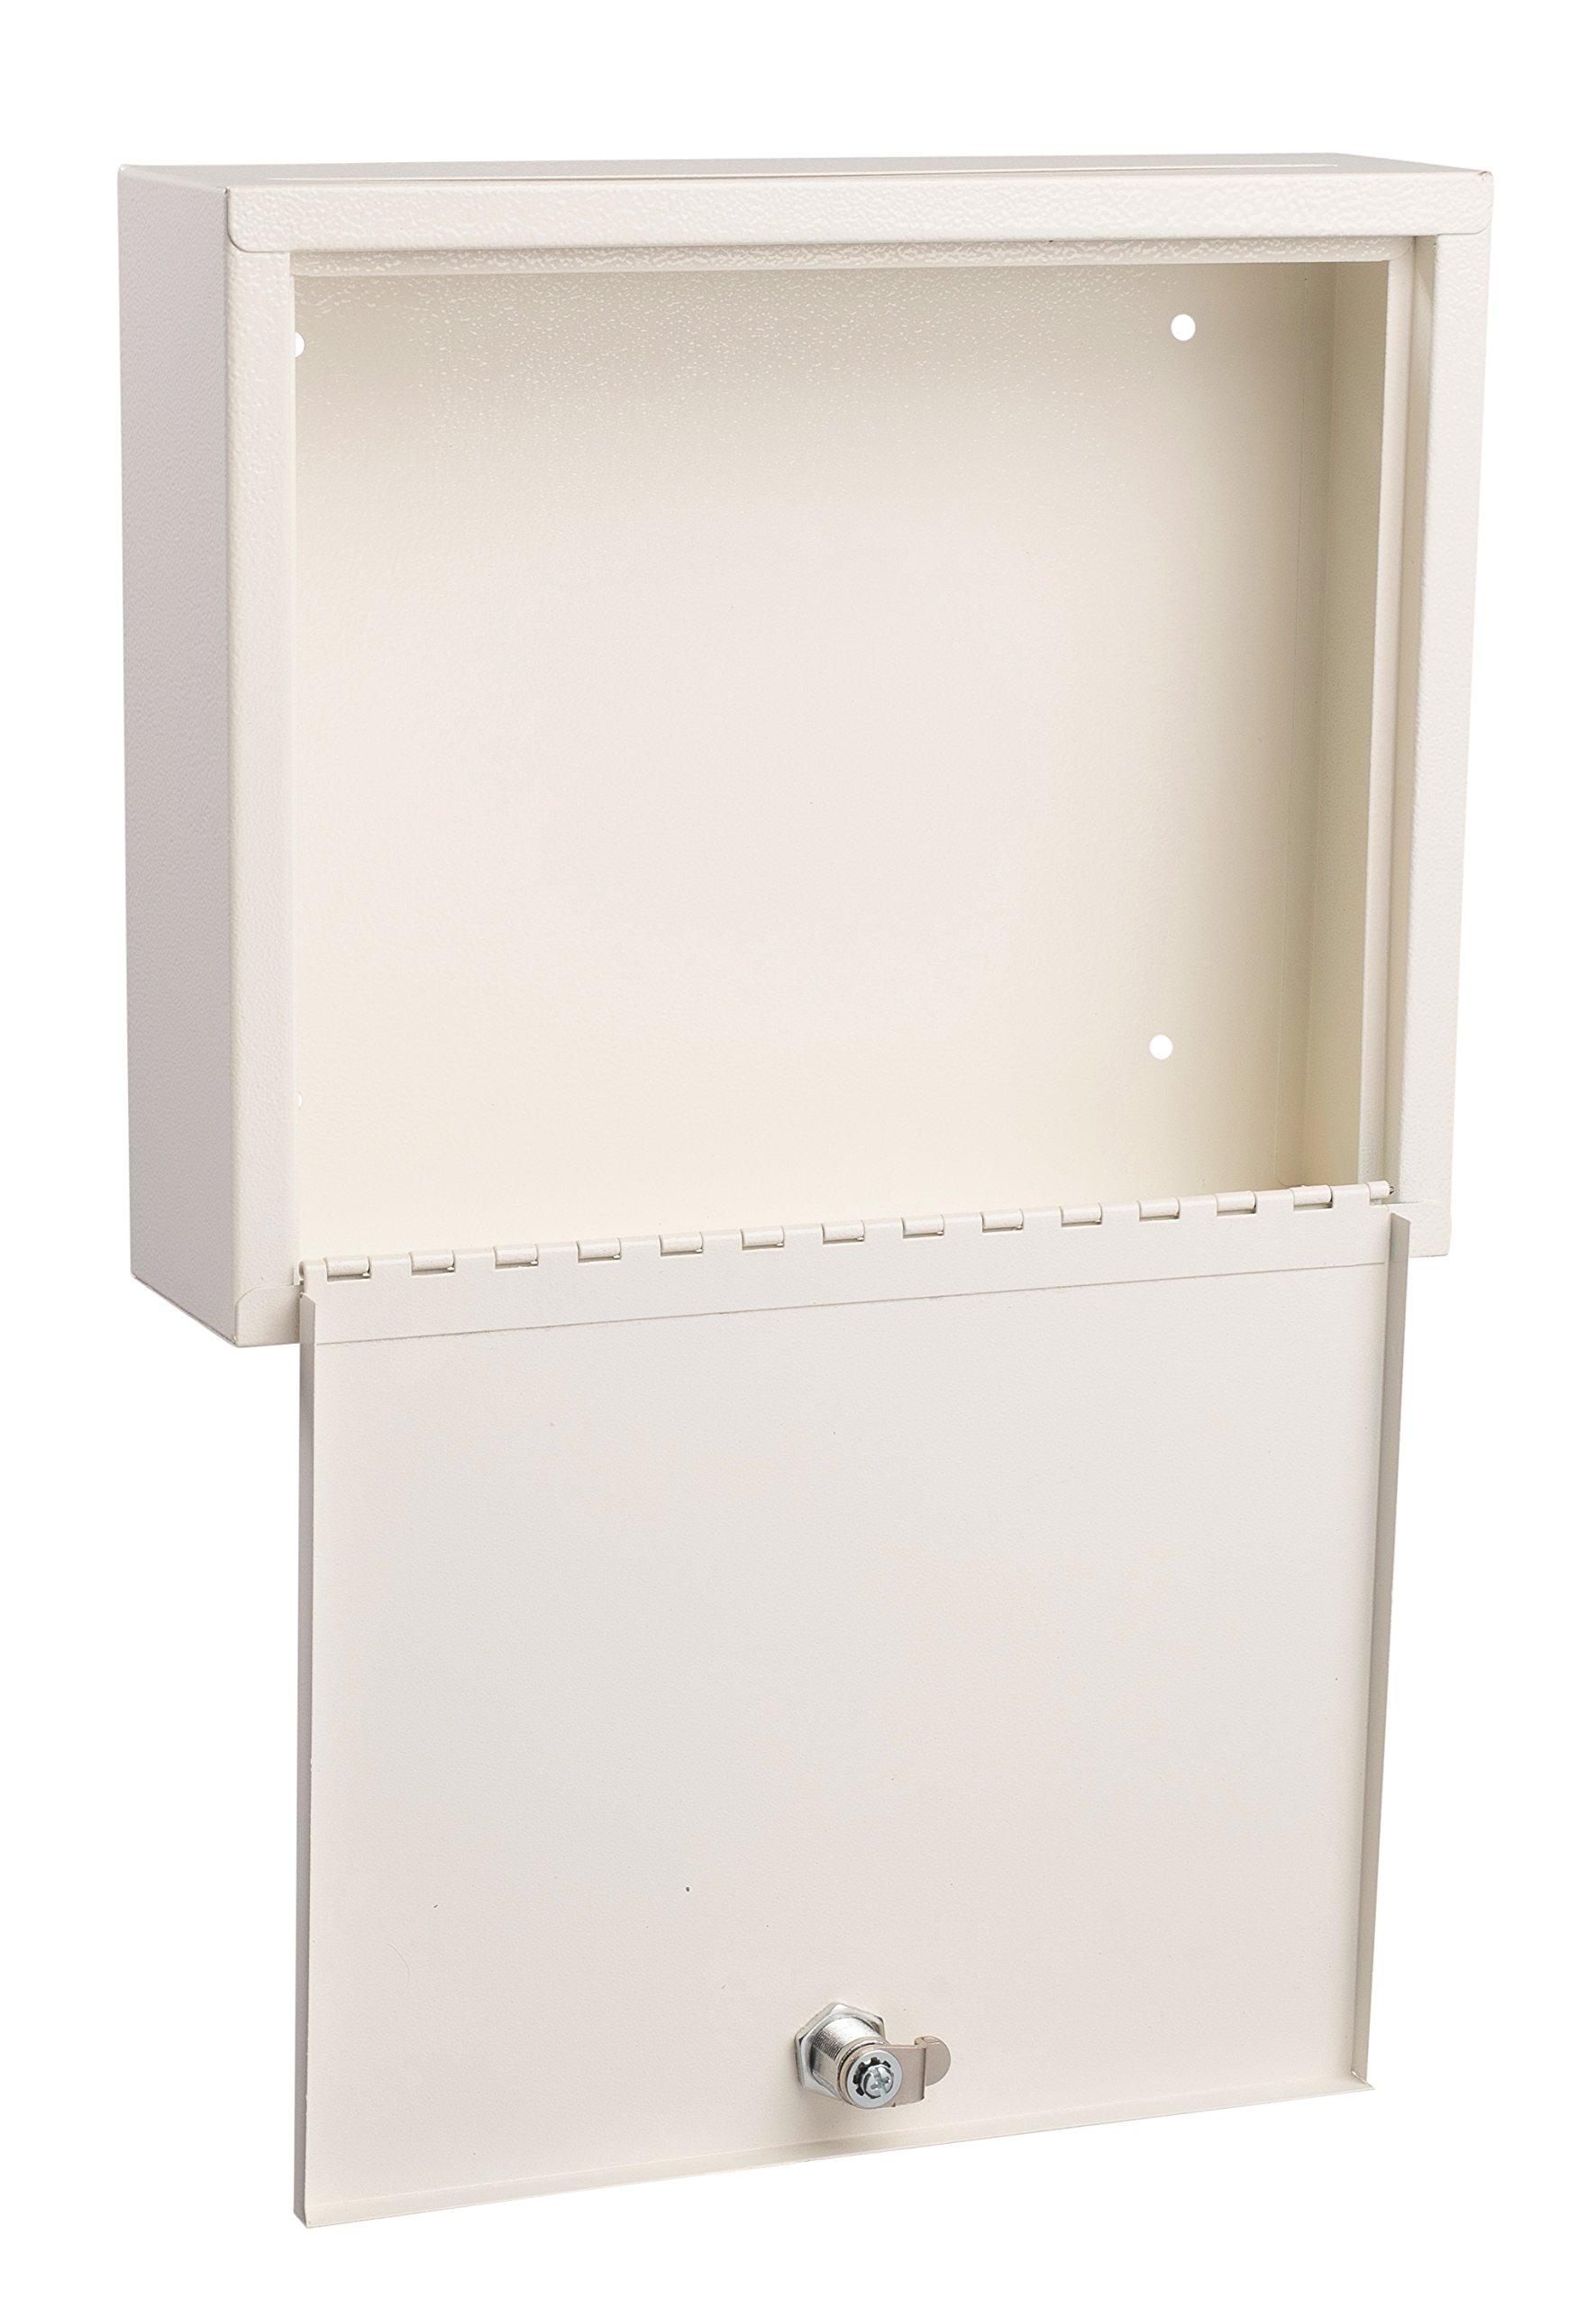 Adir Corp. Multi Purpose Large Size Suggestion Box (White) by Adir Corp. (Image #2)